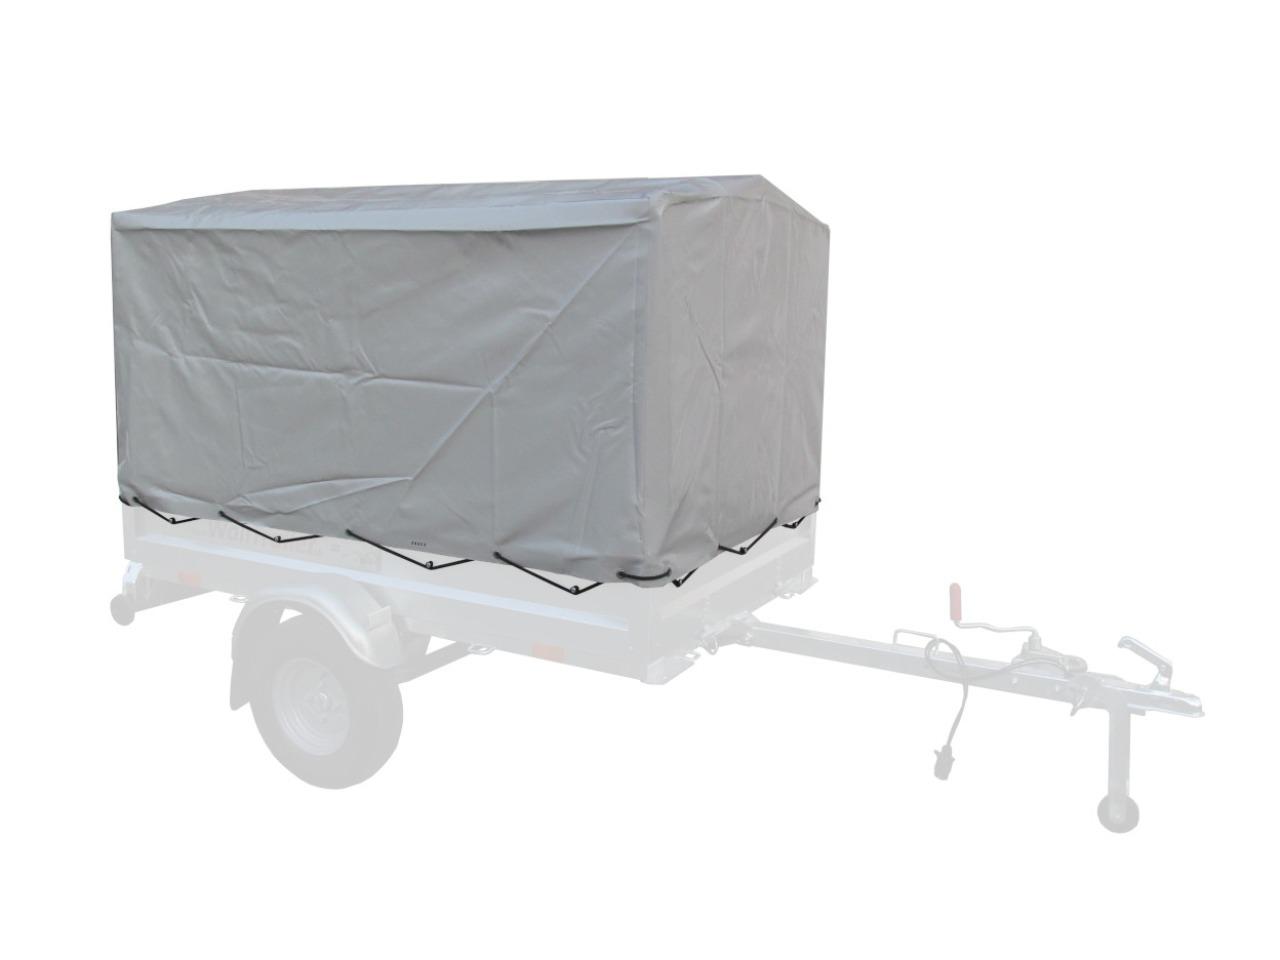 hochplane 110cm walltrailer w1 zubeh r walltrailer atvshop gmbh. Black Bedroom Furniture Sets. Home Design Ideas